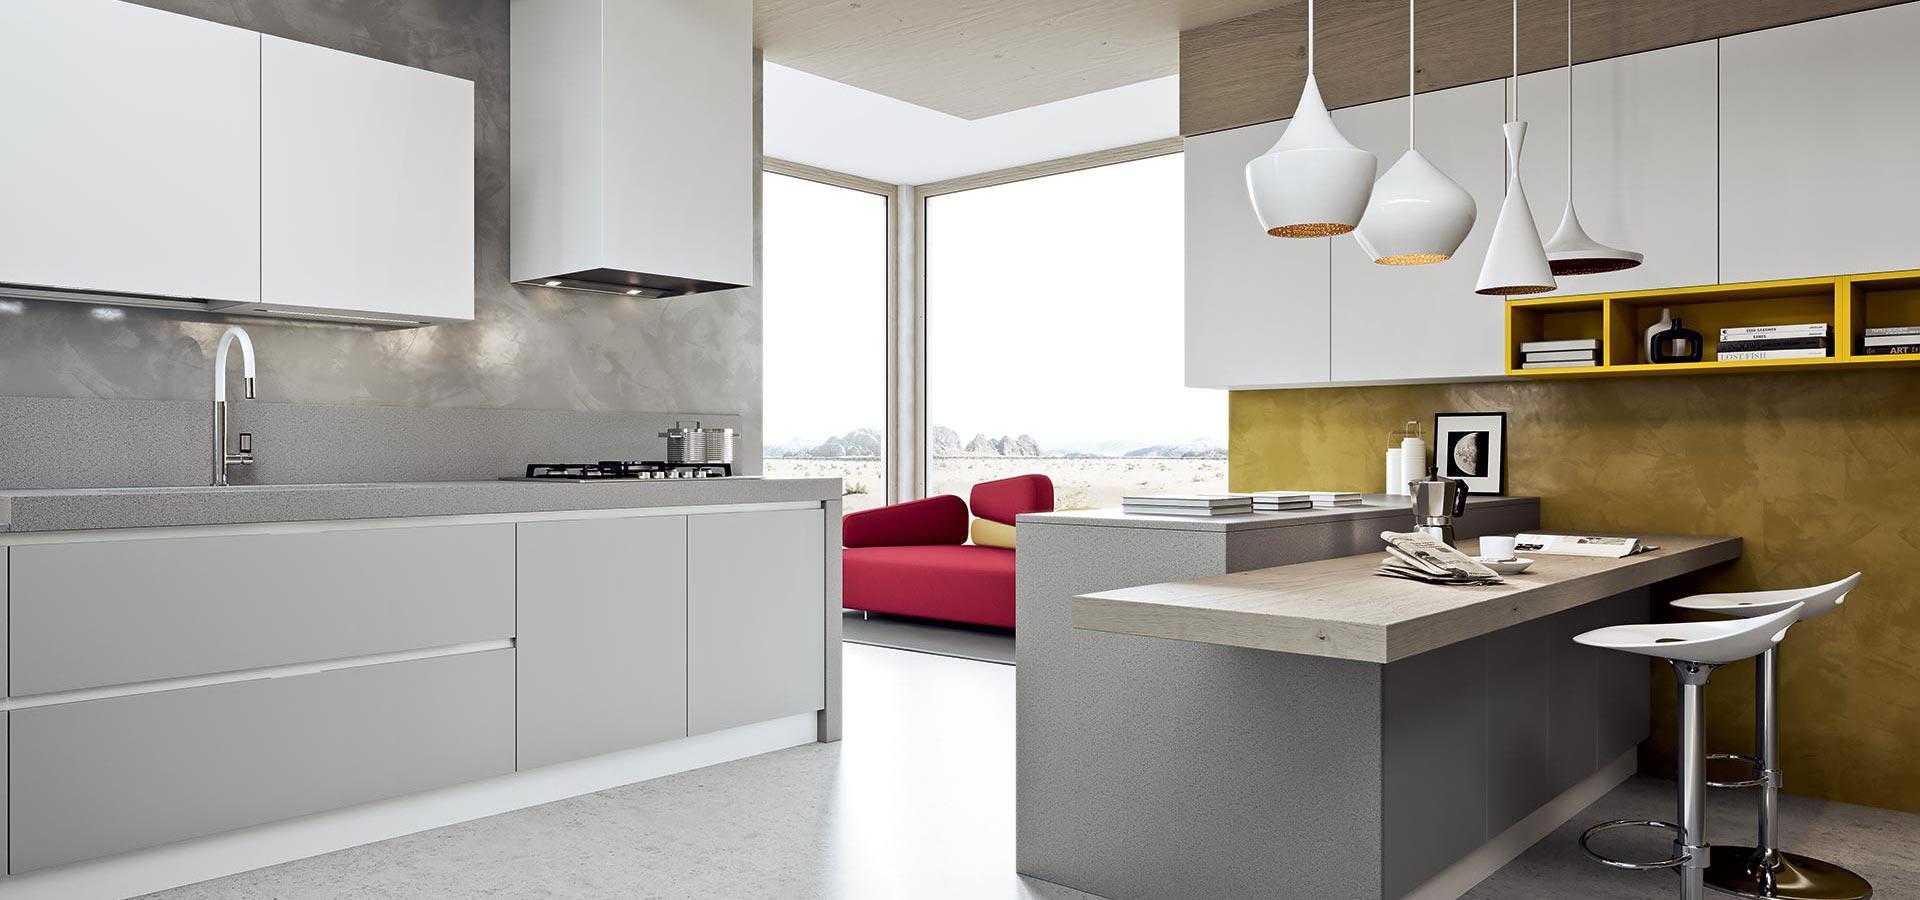 Cucina moderna bianca e grigia qn92 regardsdefemmes - Mobili x cucina ...